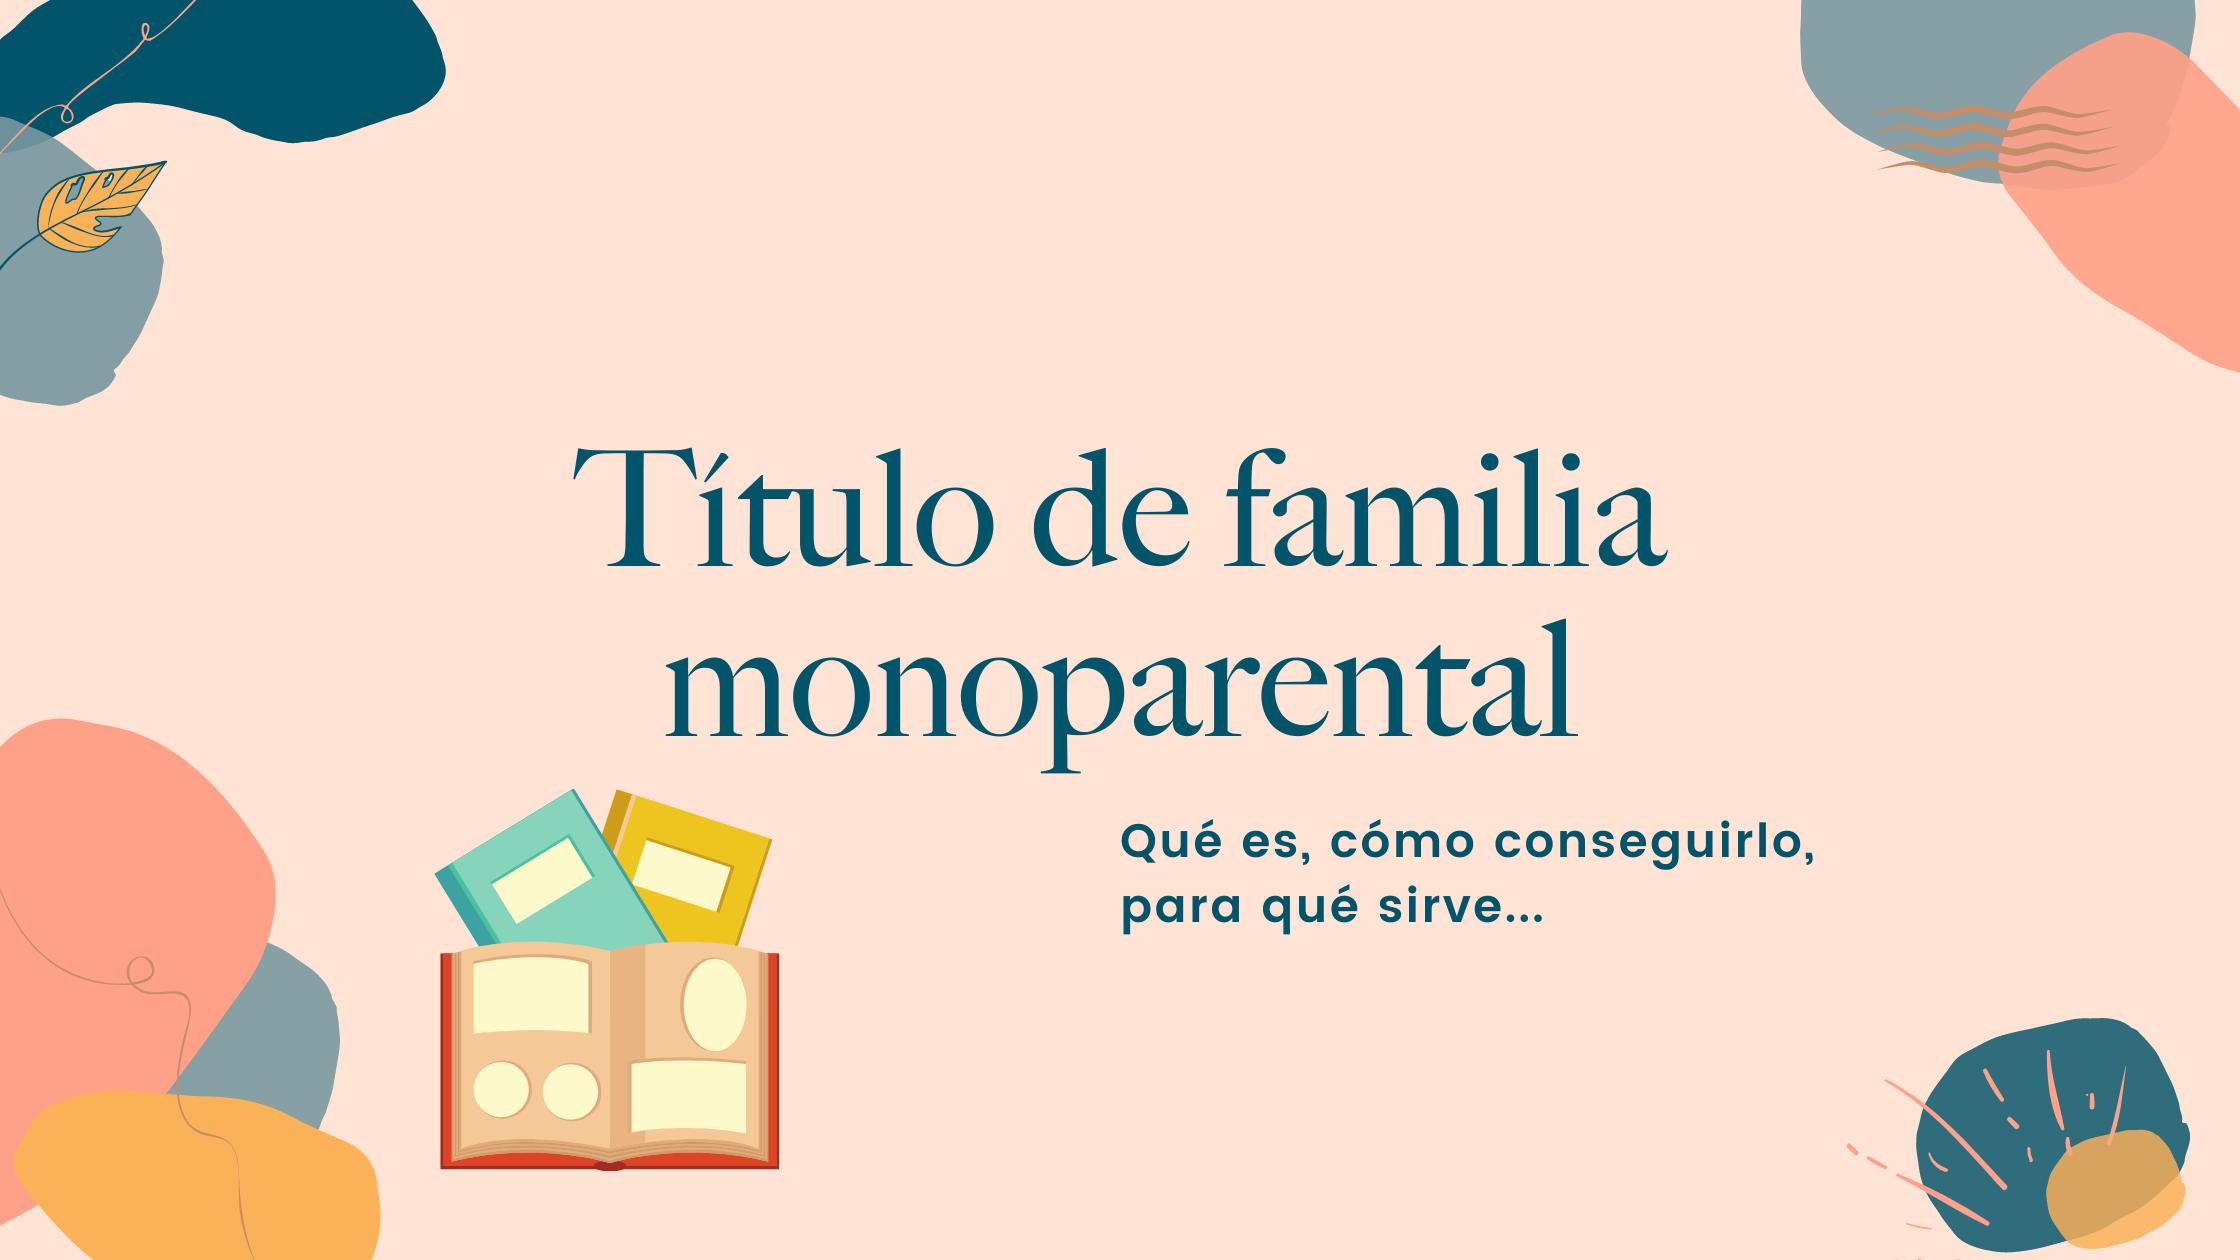 Título de familia monoparental